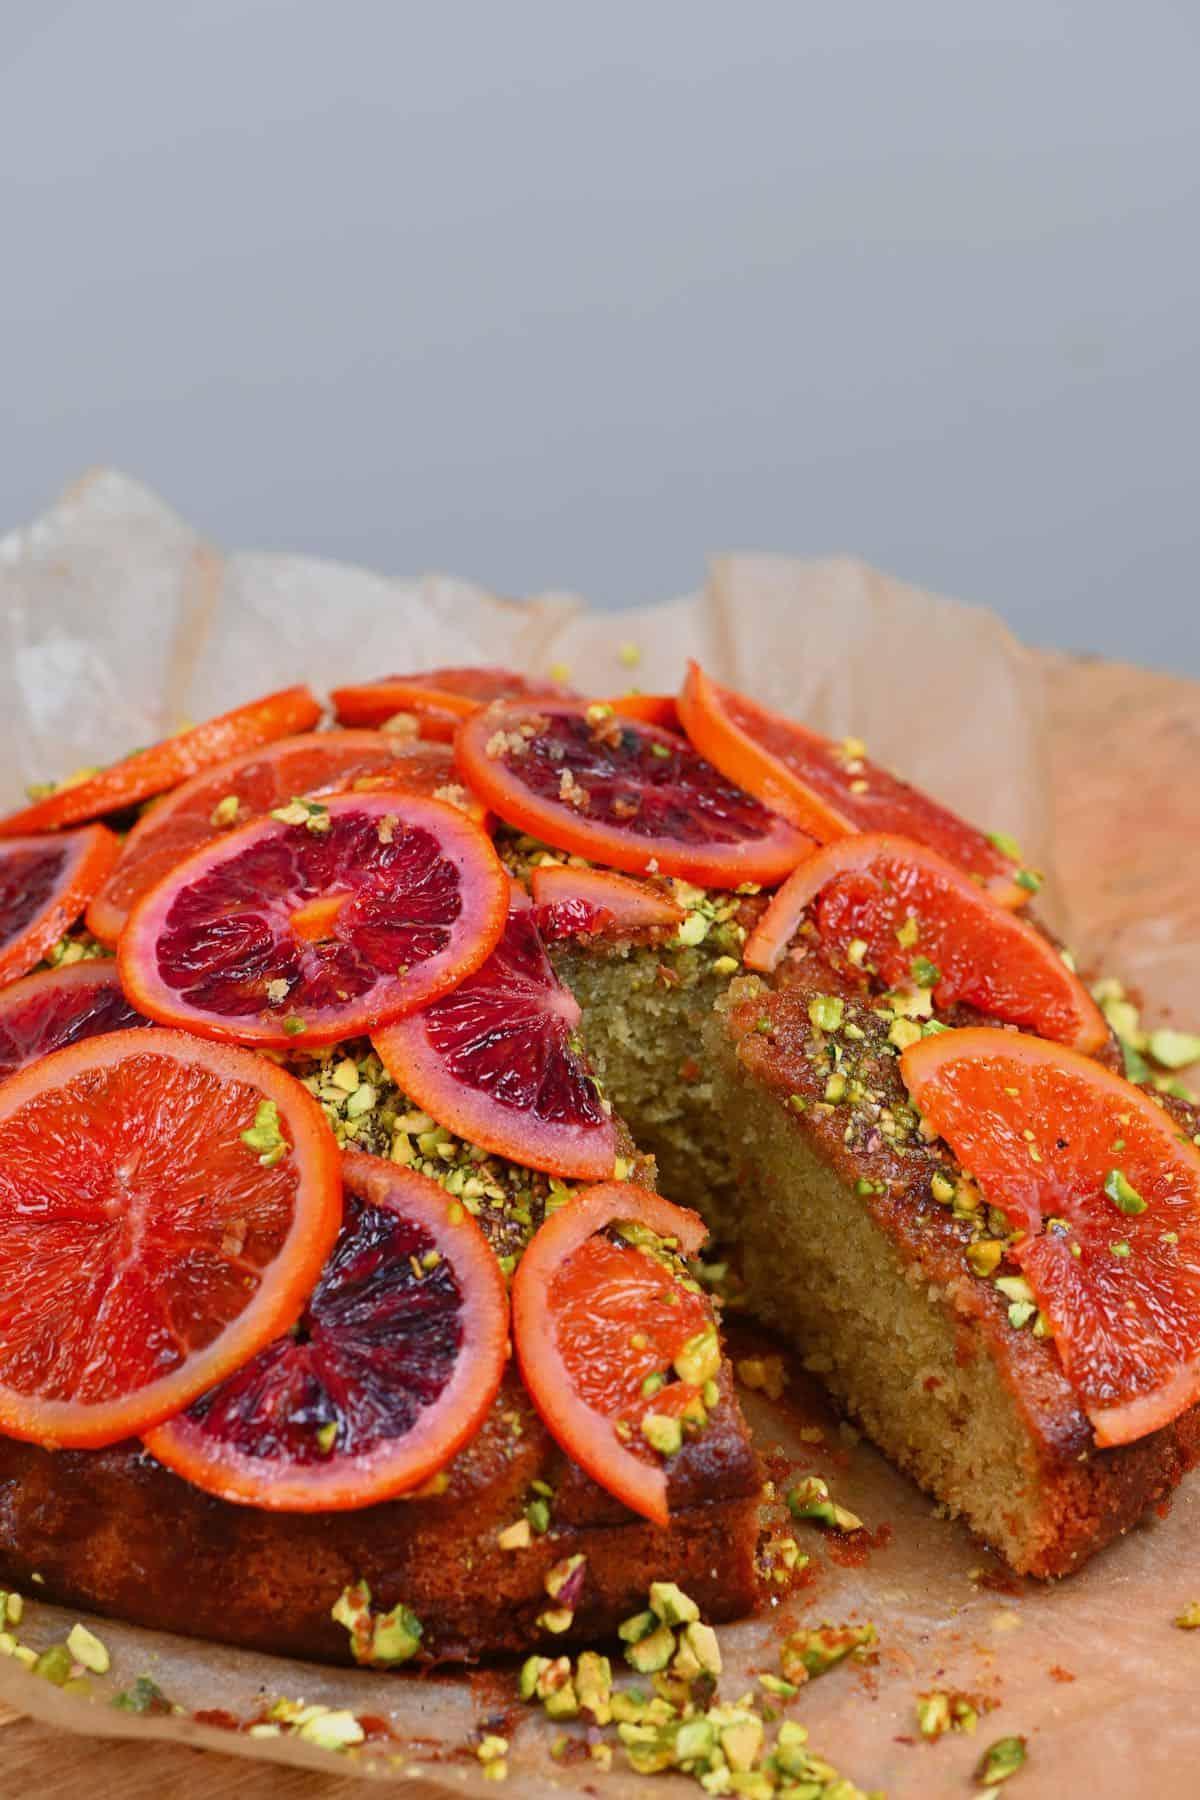 An orange pistachio cake with a slice cut off